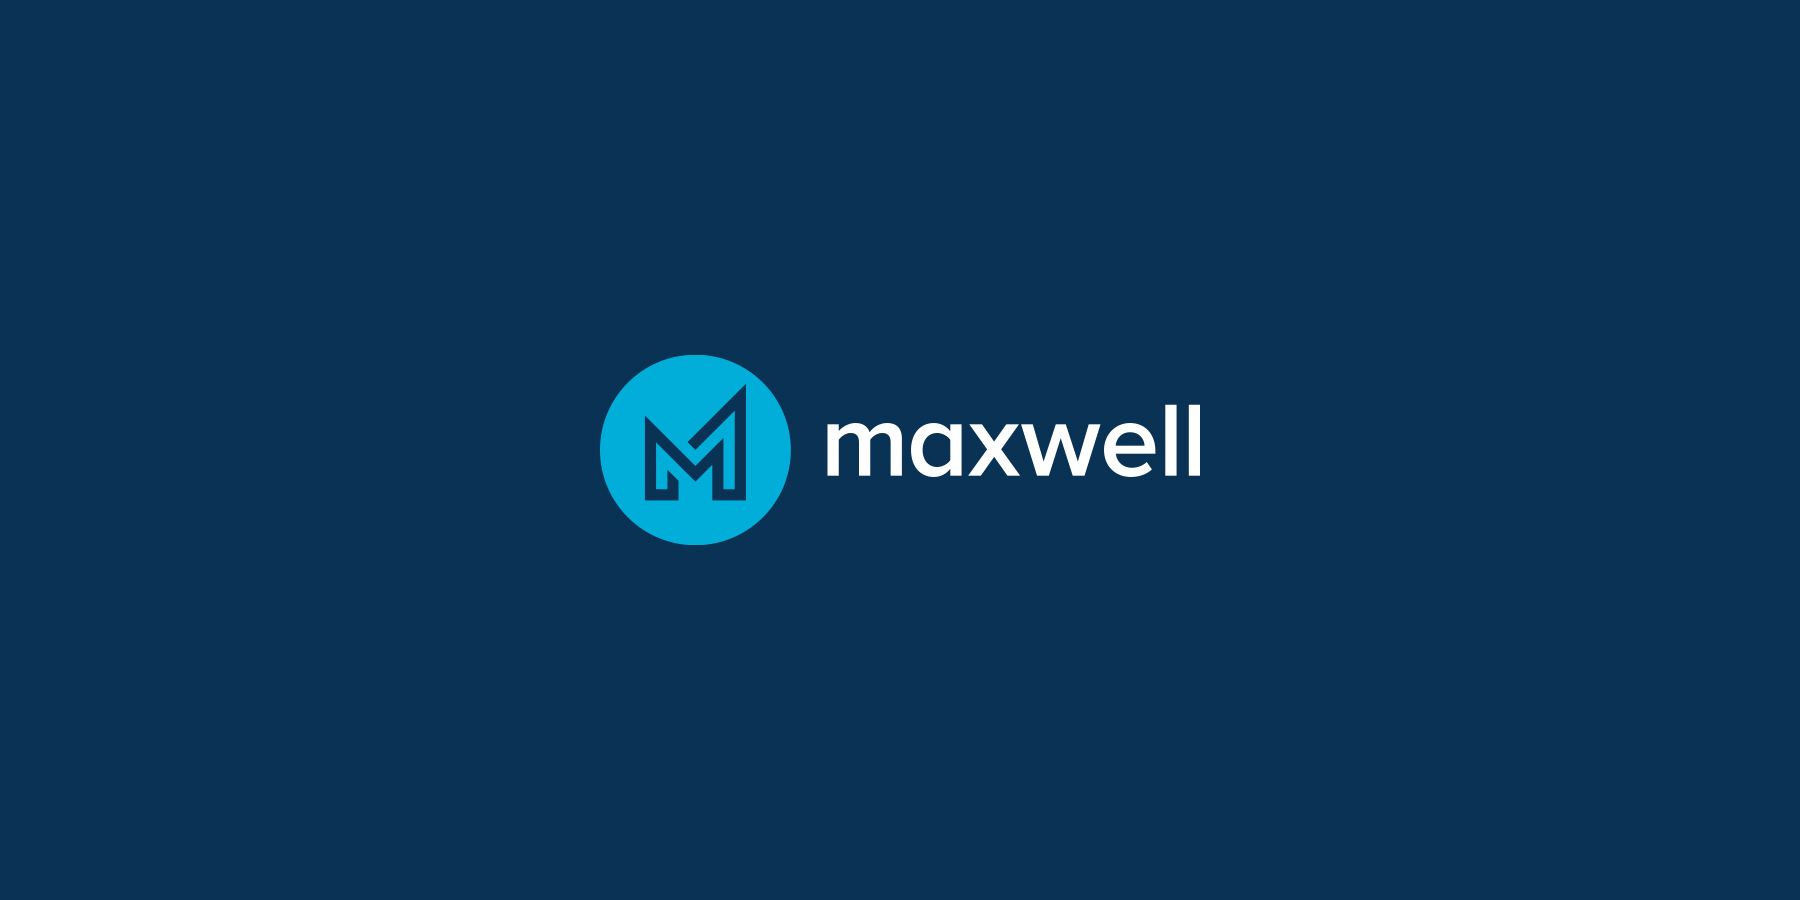 maxwell-logo-design-01